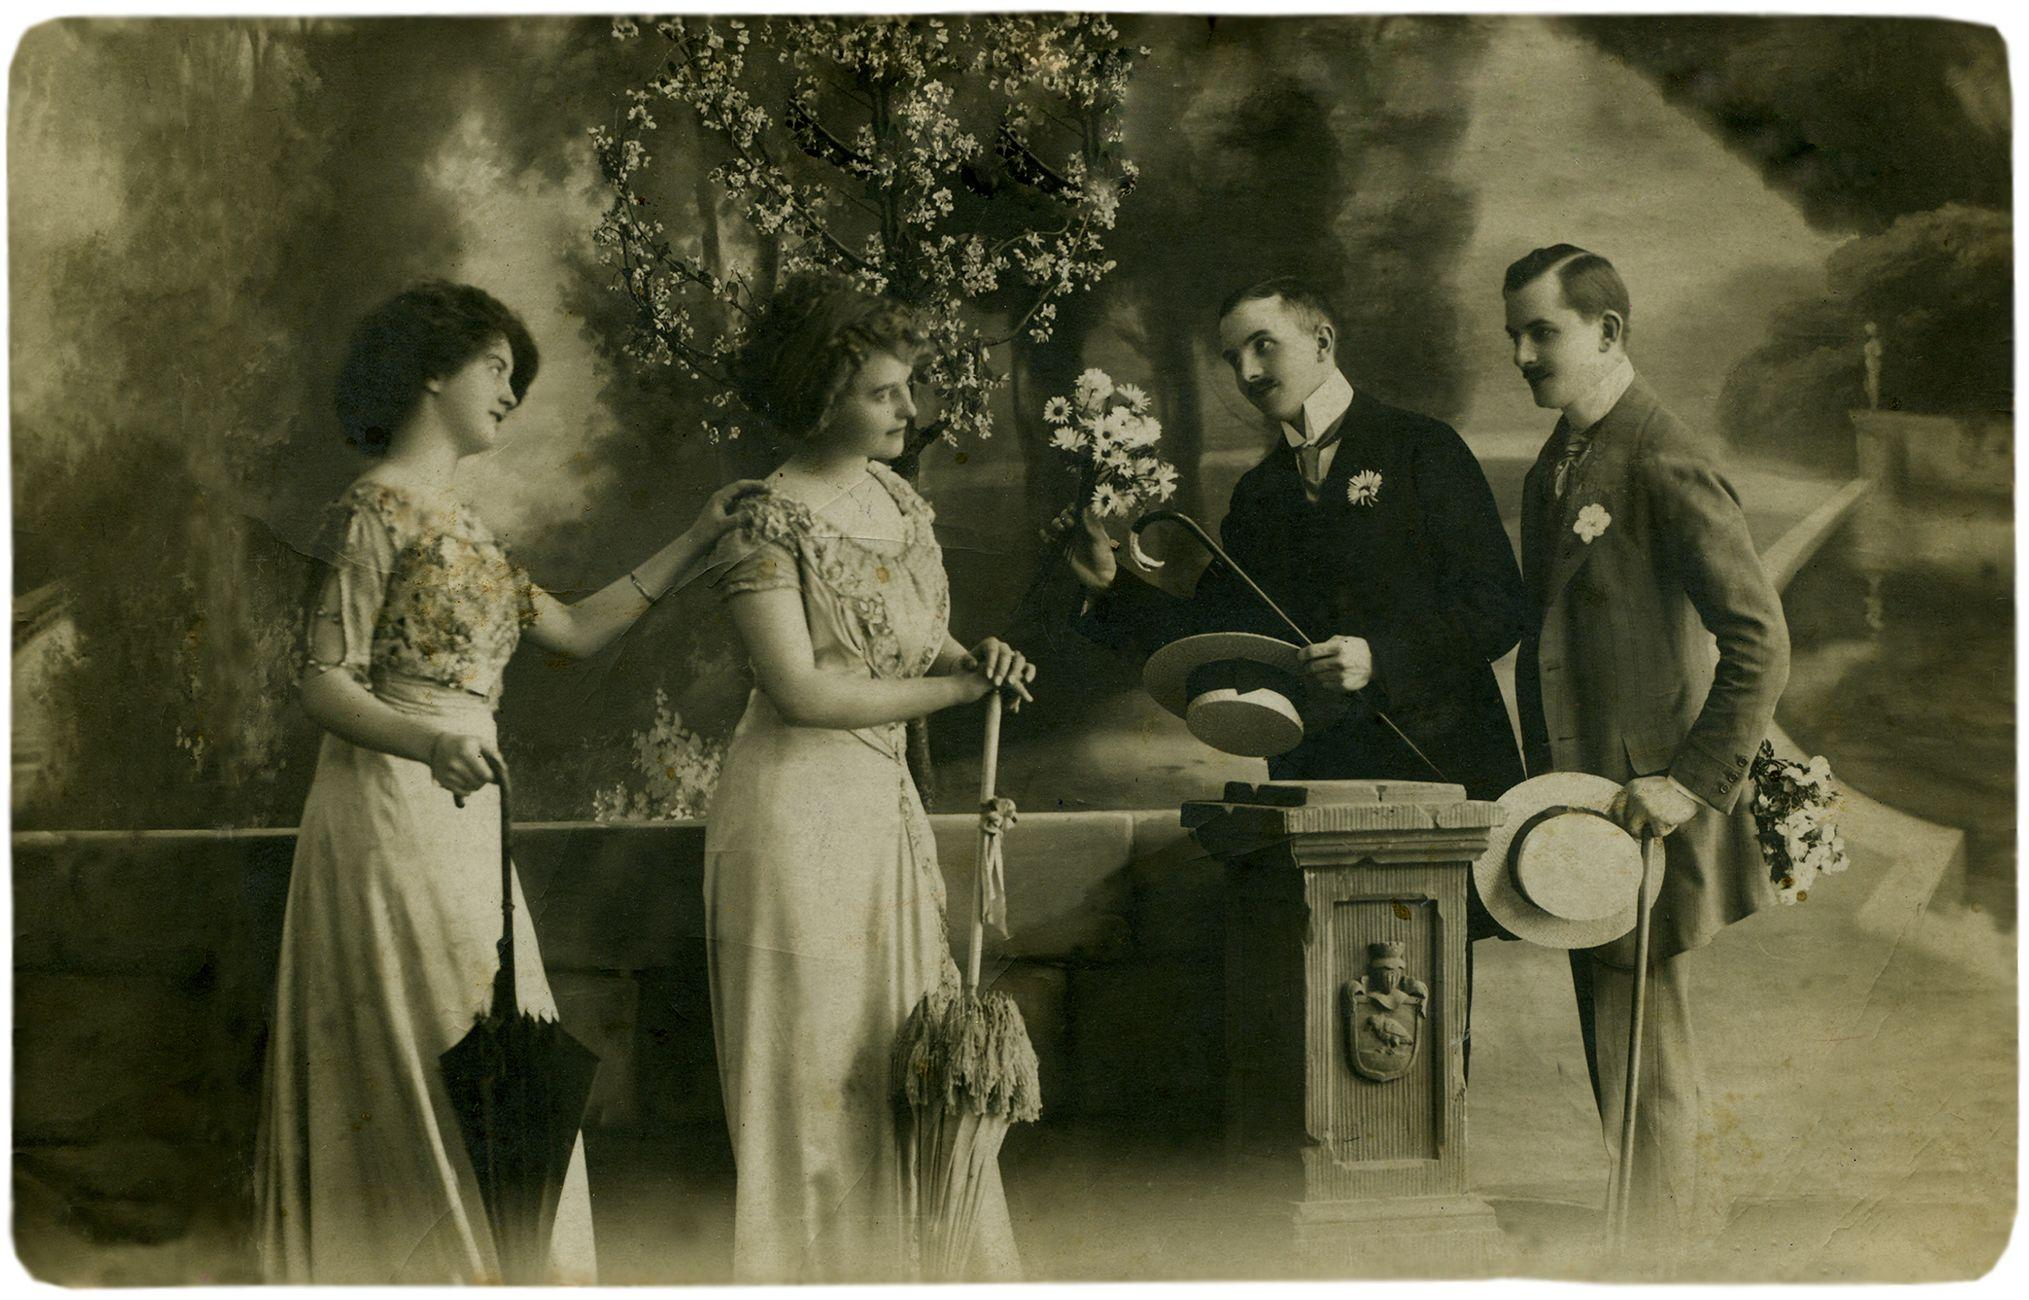 vintage photograph of Edwardian style group